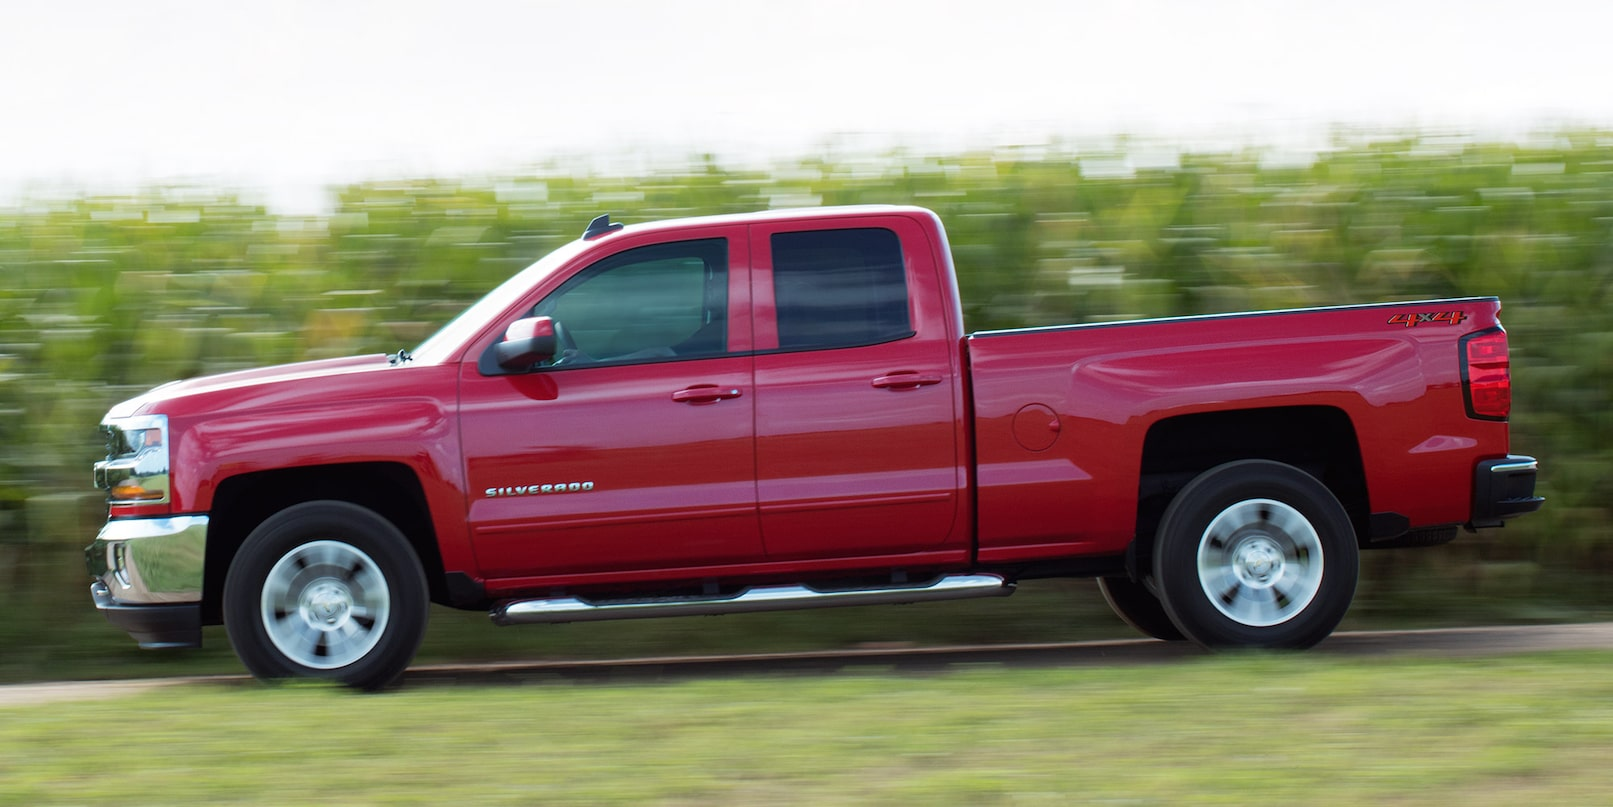 New 2019 Chevrolet Silverado for sale near Philadelphia, PA; Trenton, NJ | Lease or Buy a New ...